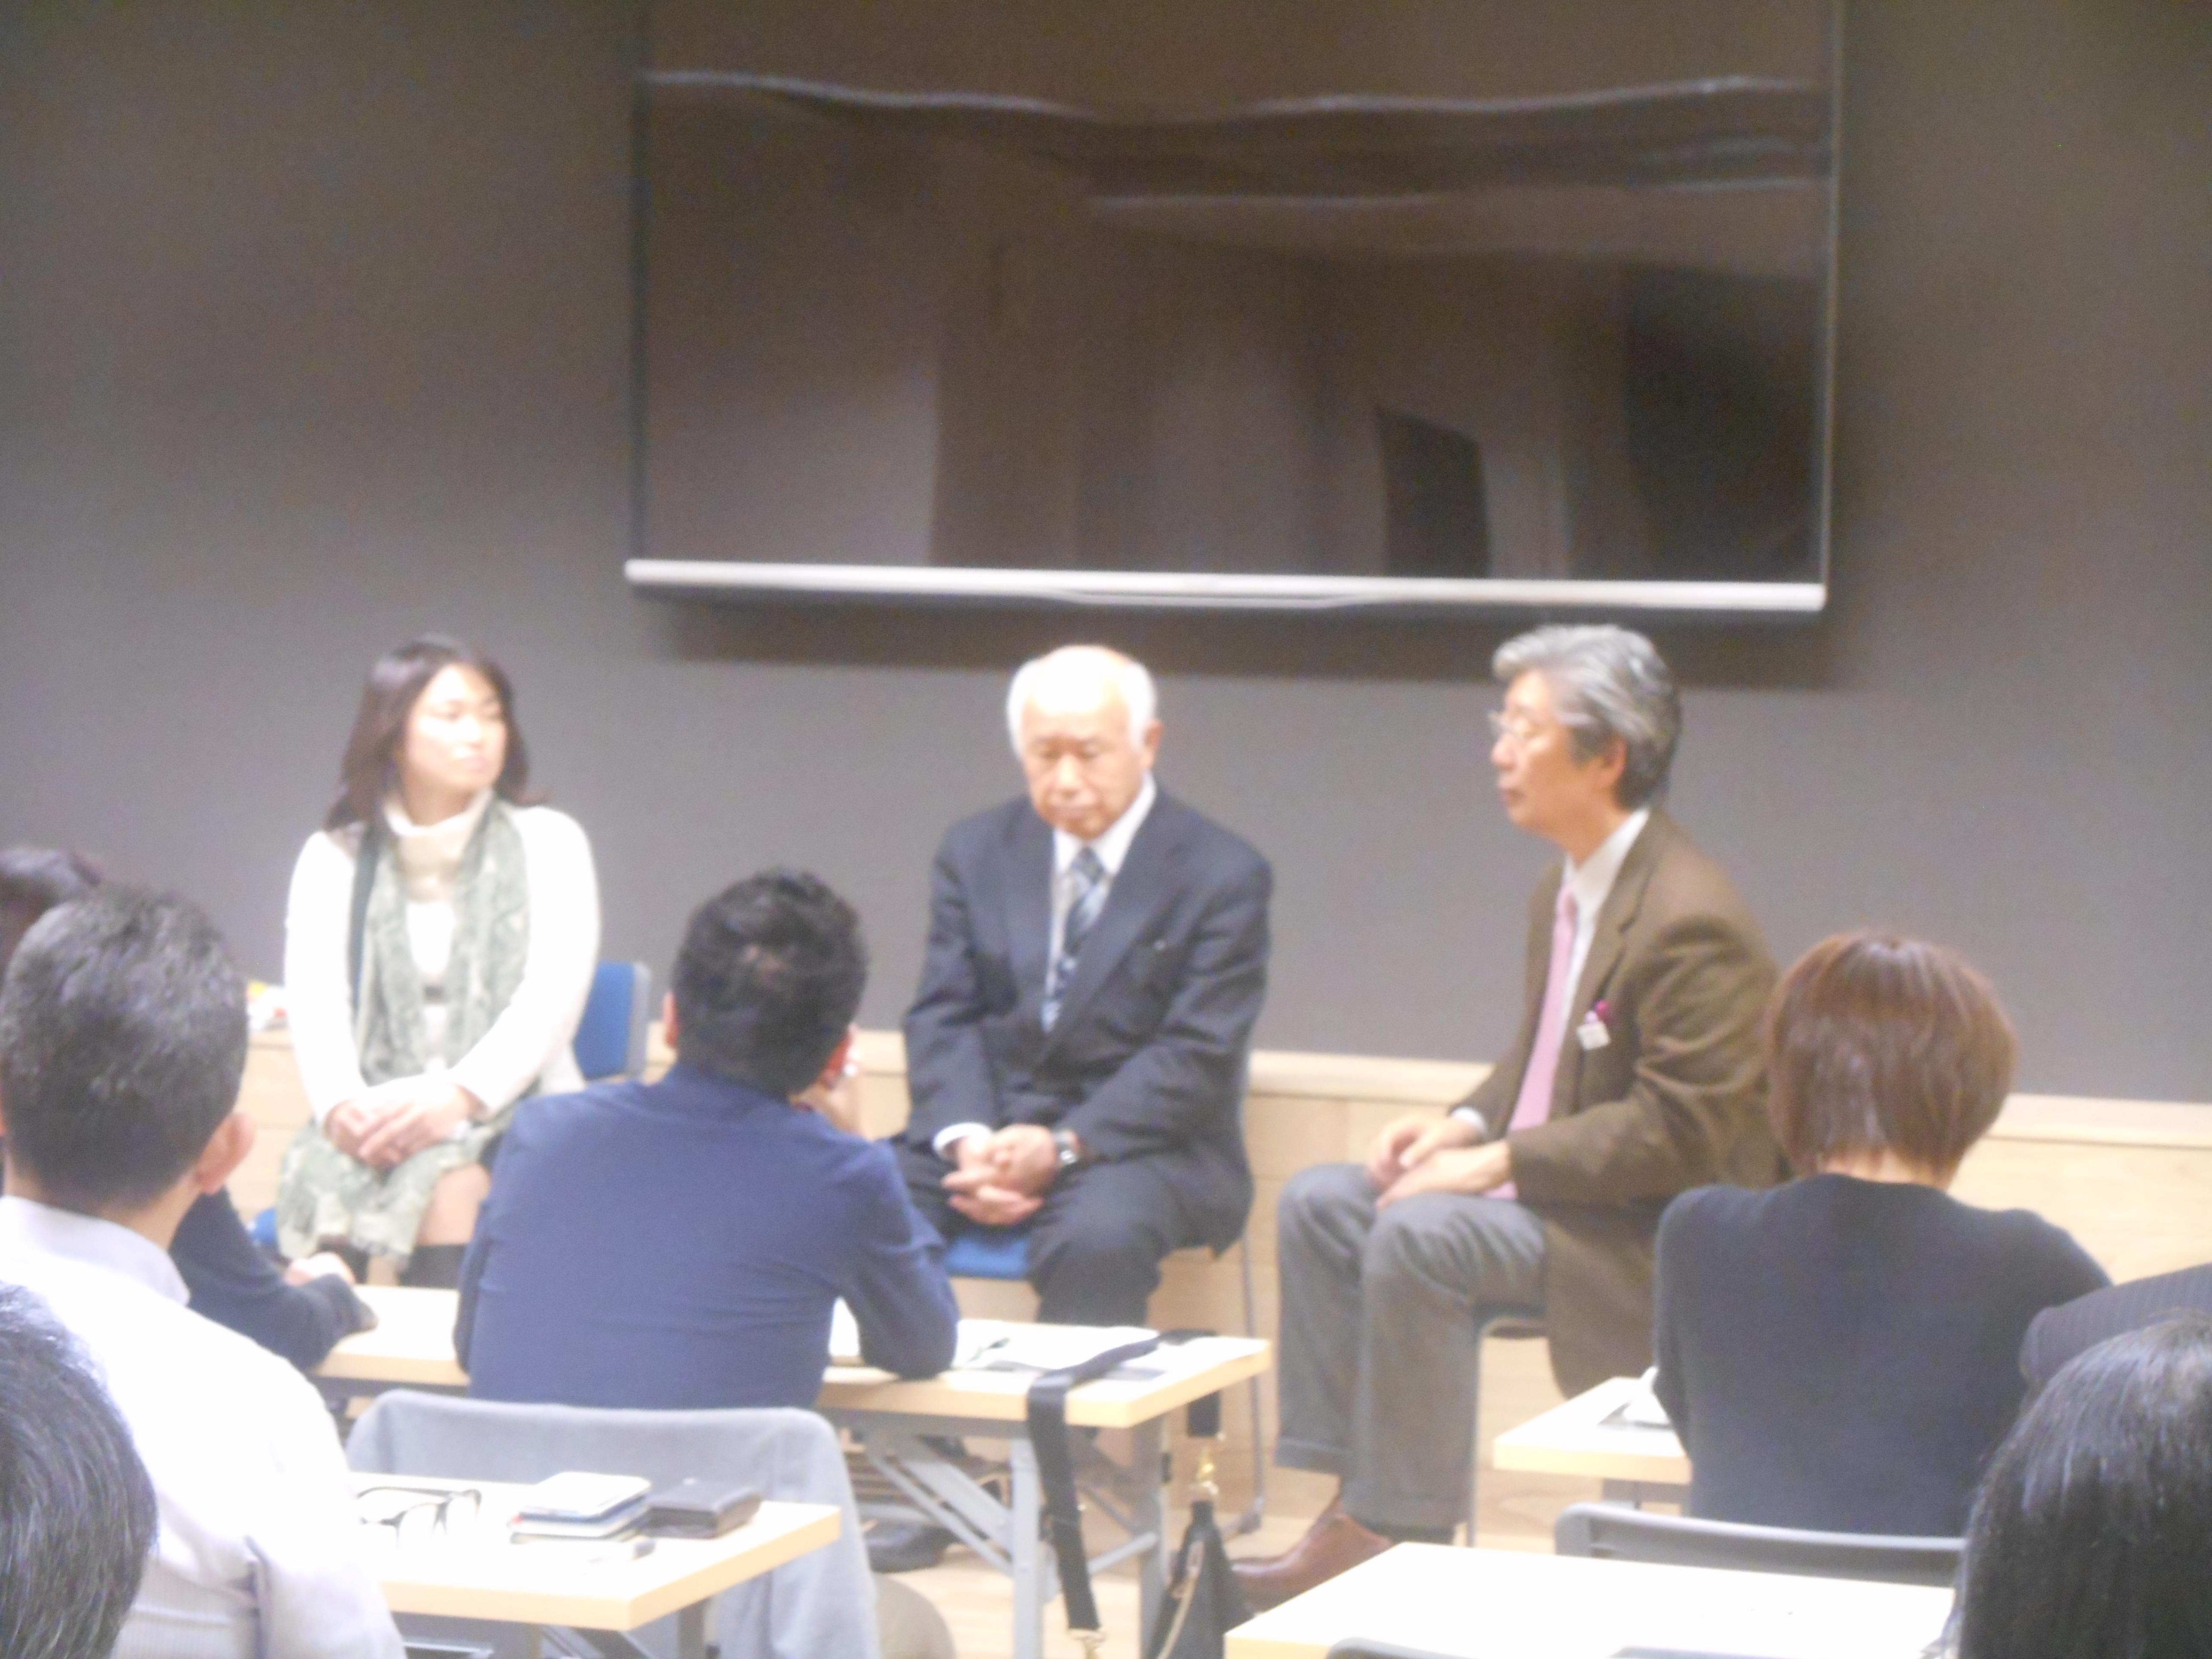 DSCN0476 - 4月1日東京思風塾の開催になります。